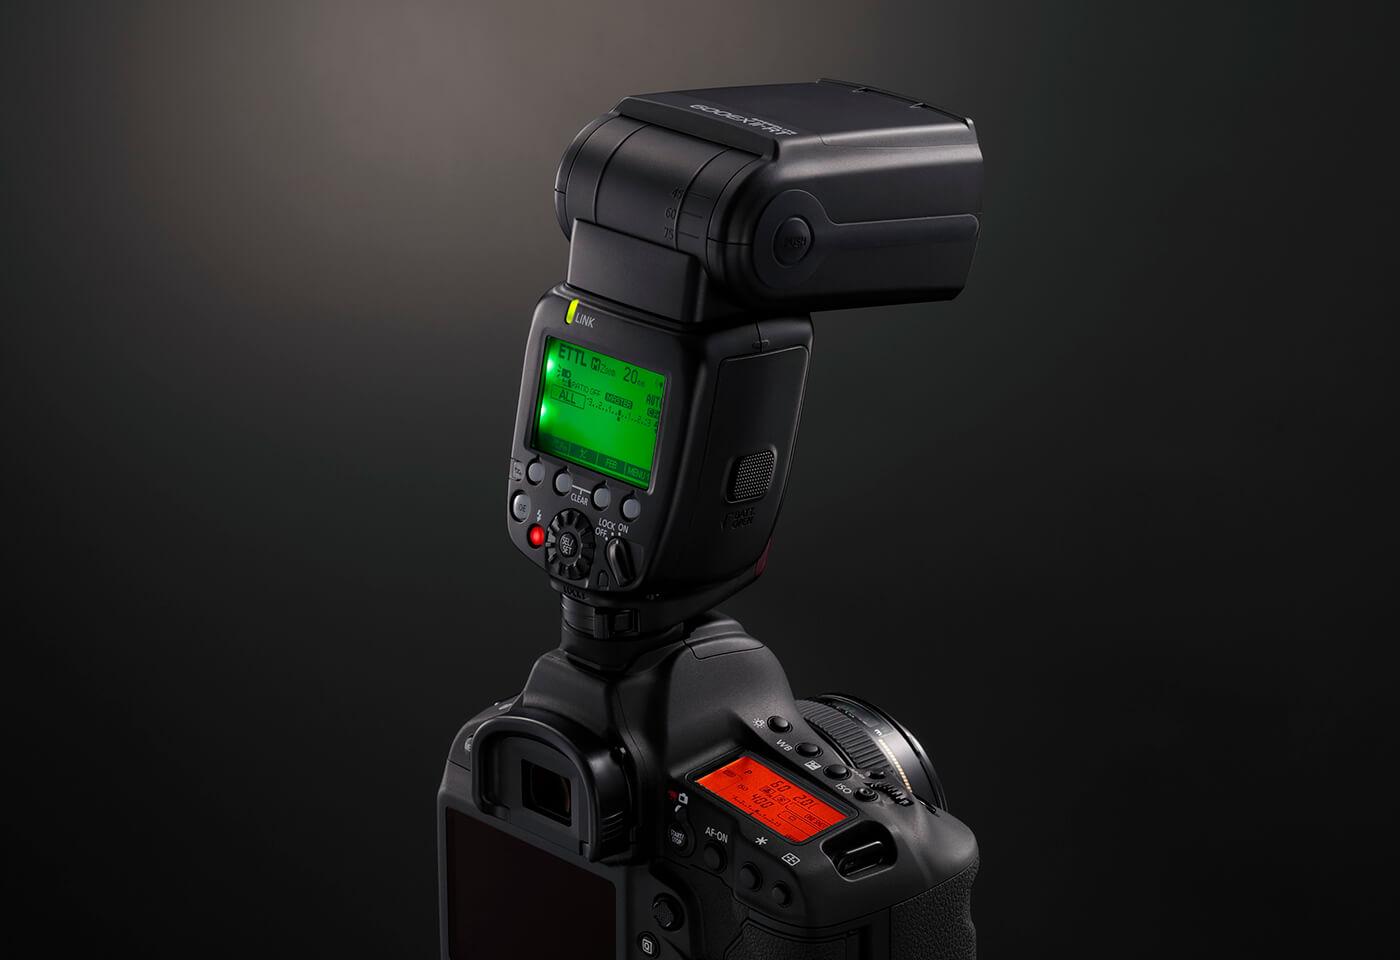 Speedlite Flashes by Canon